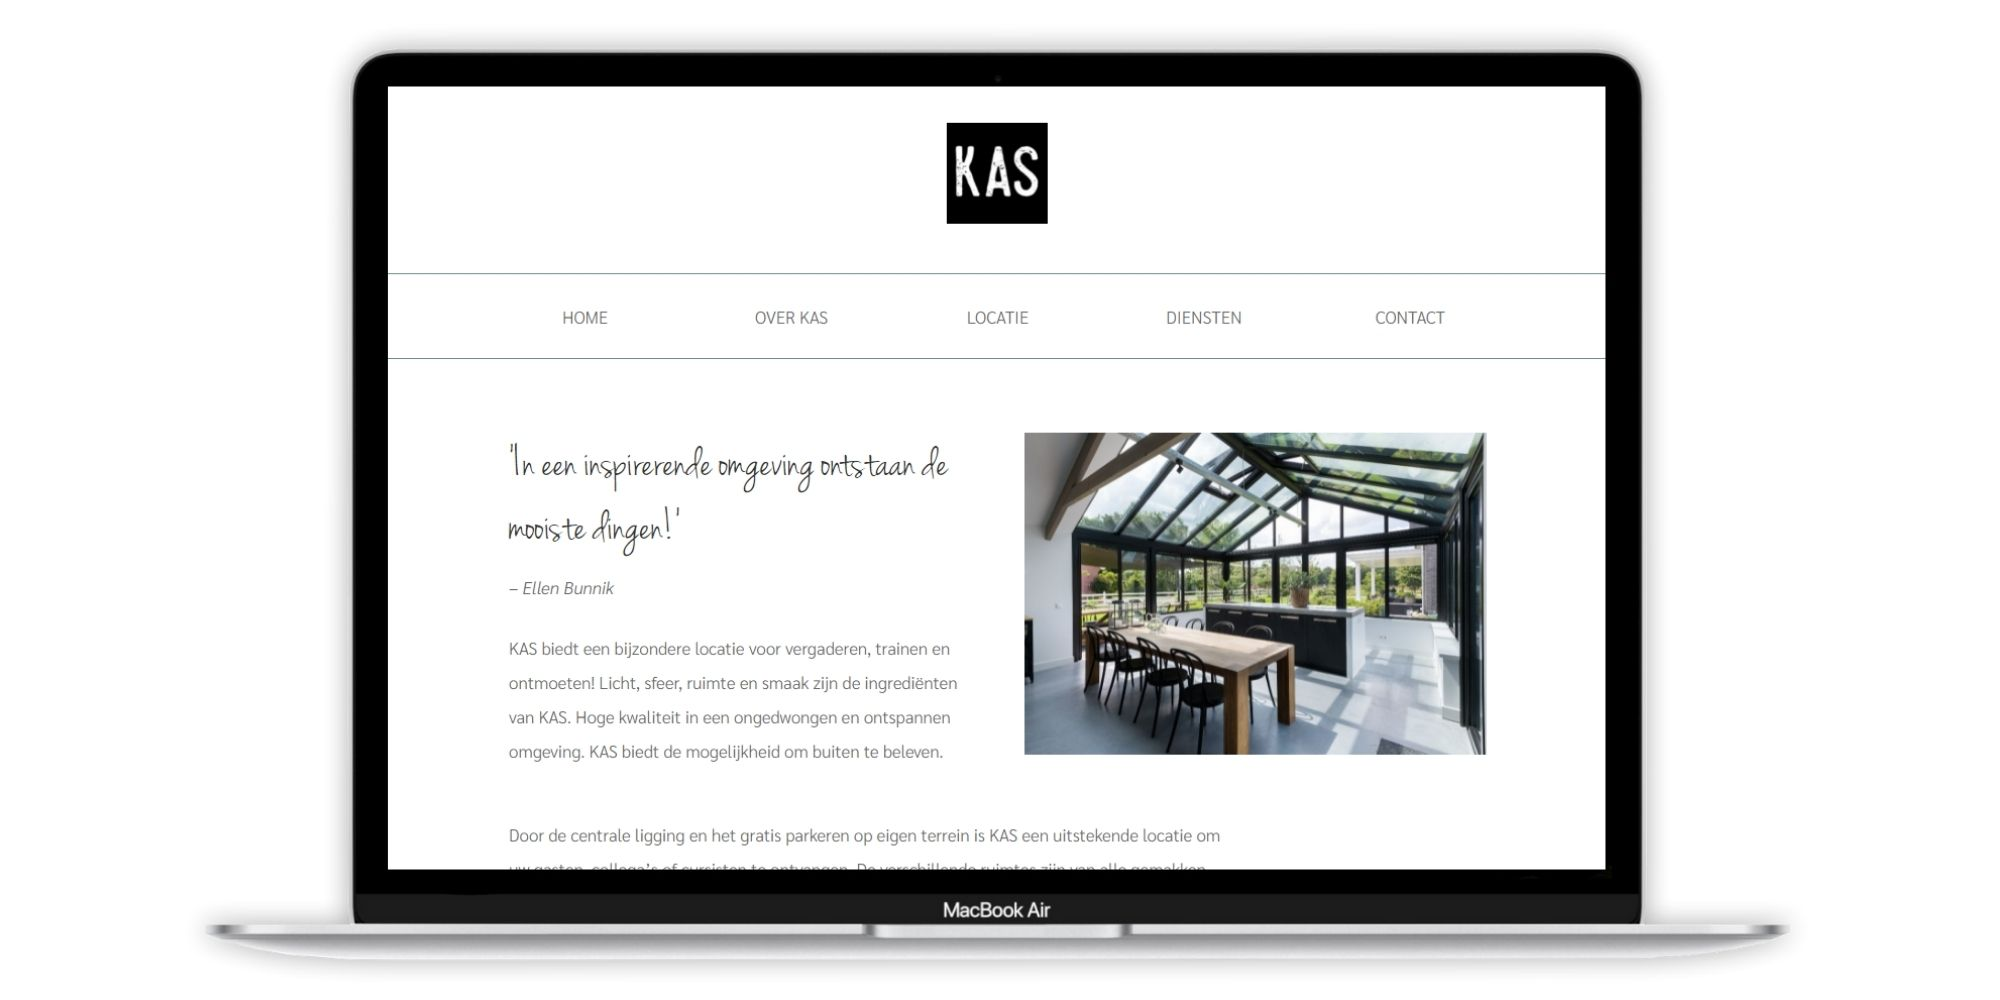 Portfolio project KAS Ontmoetingslocatie Paula Terpstra Webdesign project afbeelding